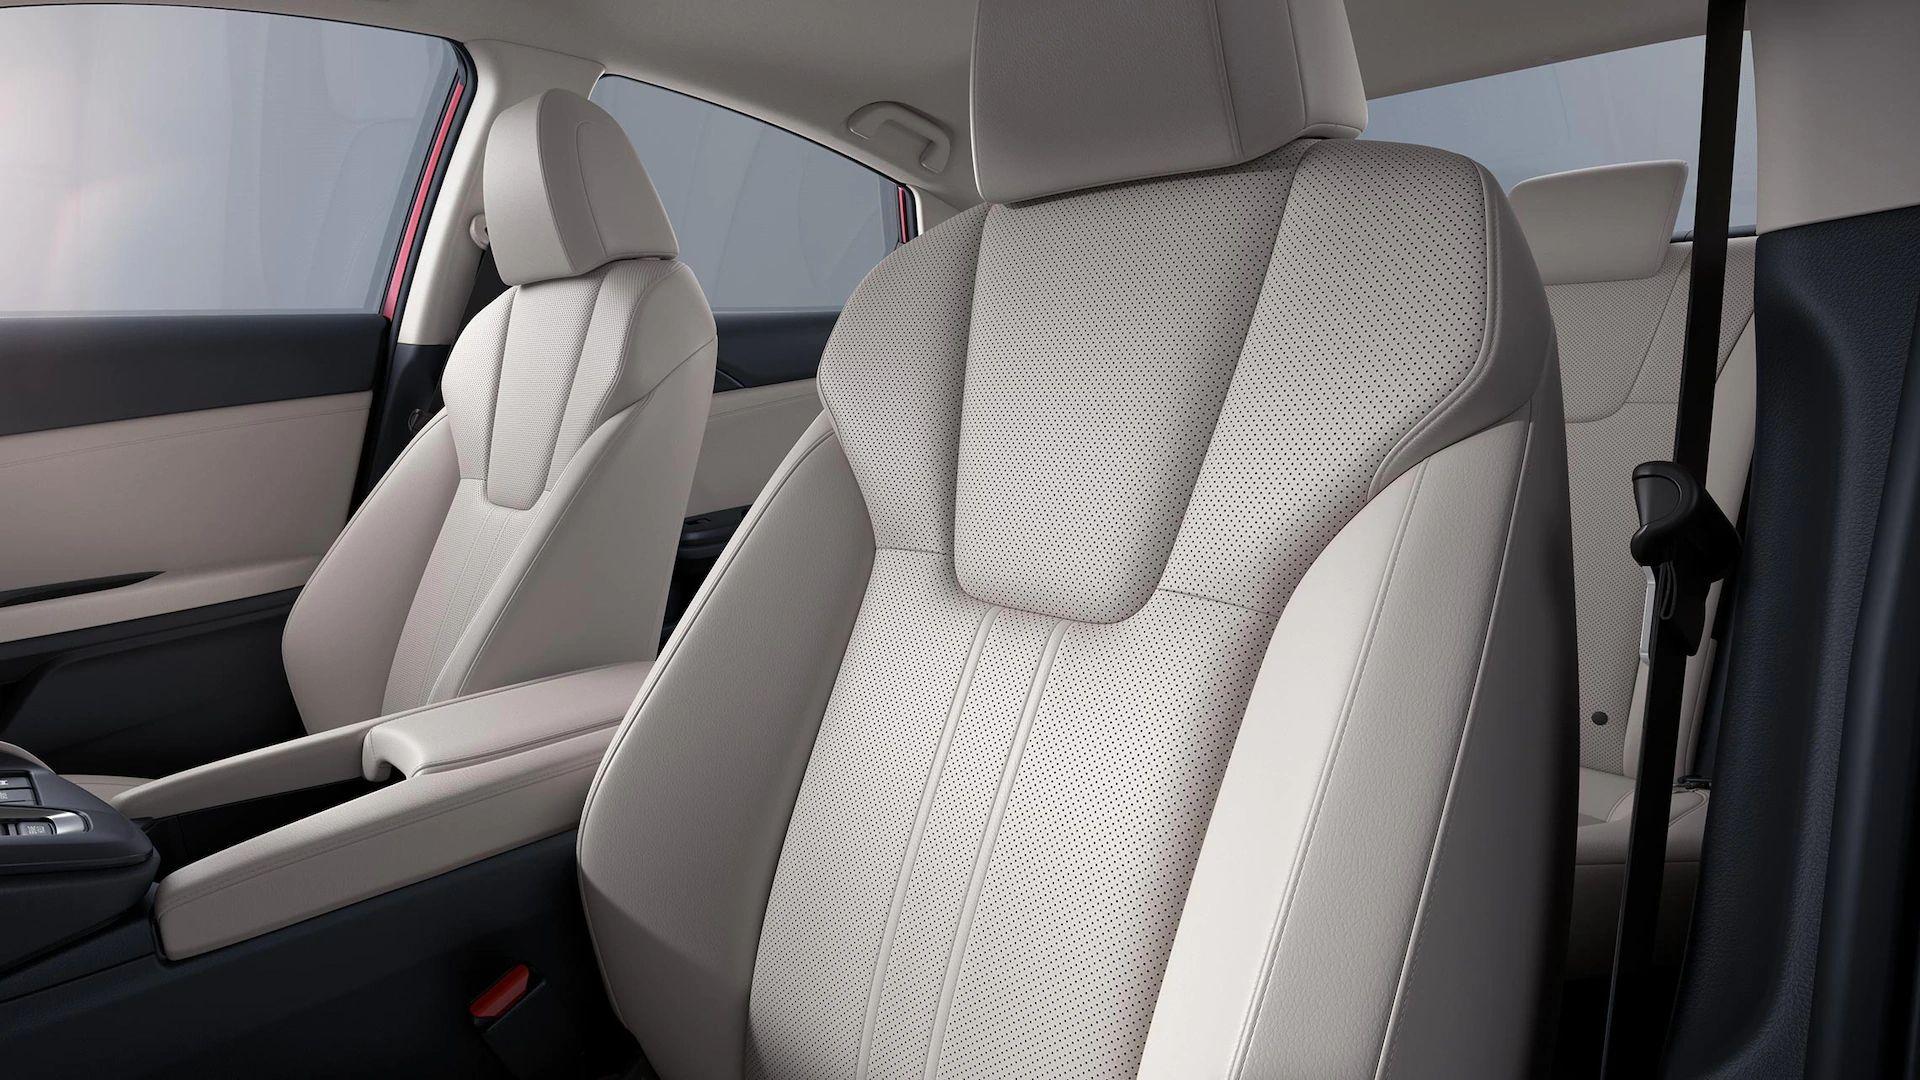 New 2020 Honda Insight for sale near Des Plaines, IL